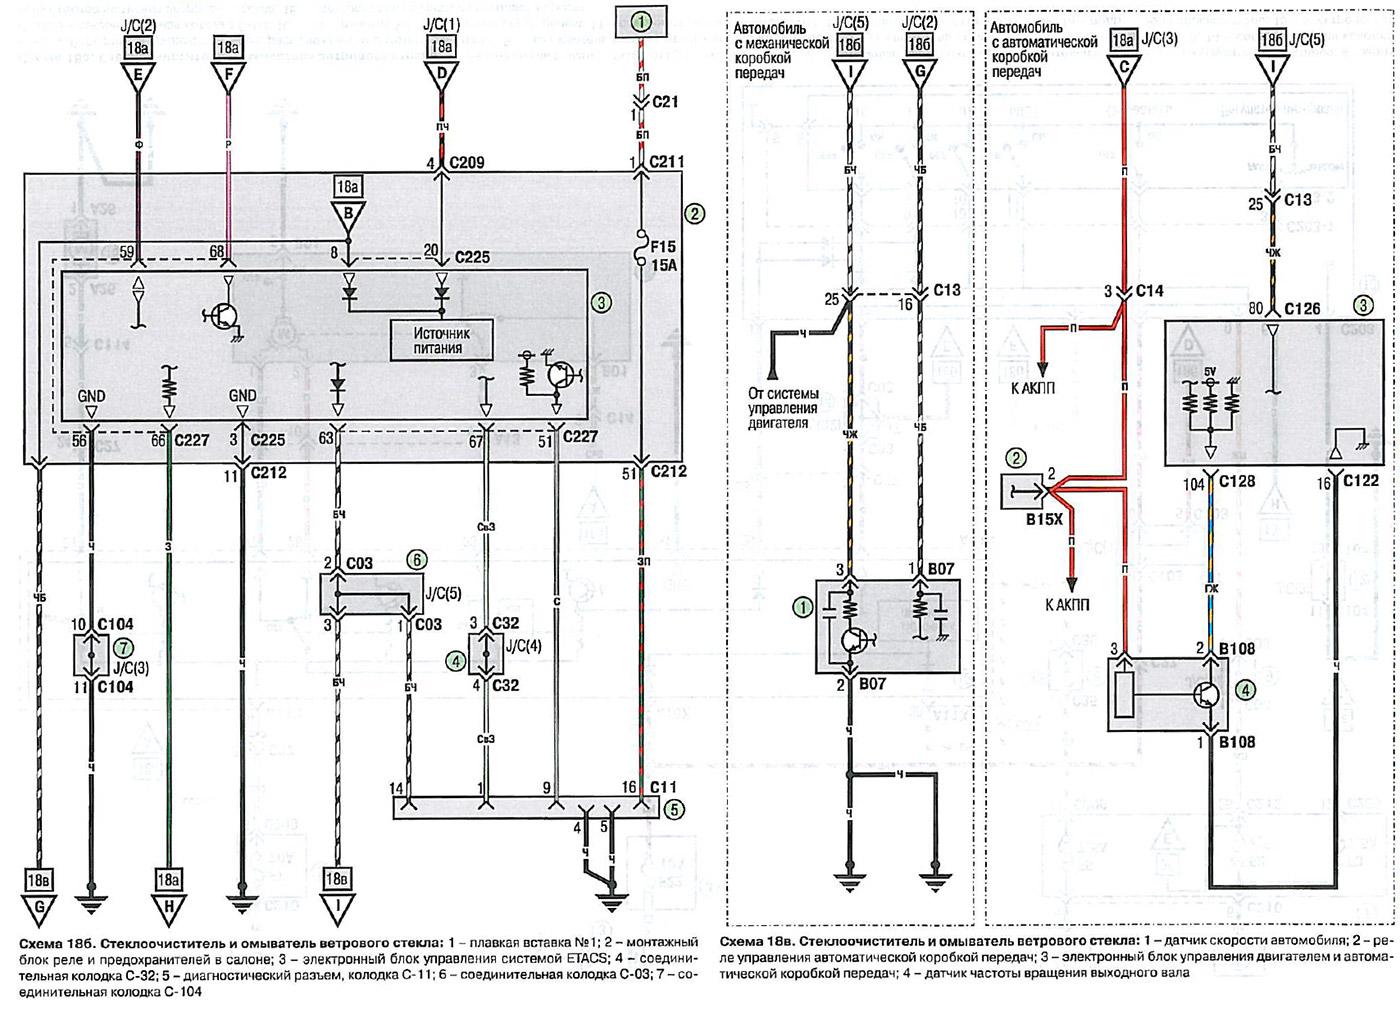 Схема электрооборудования мицубиси лансер фото 191